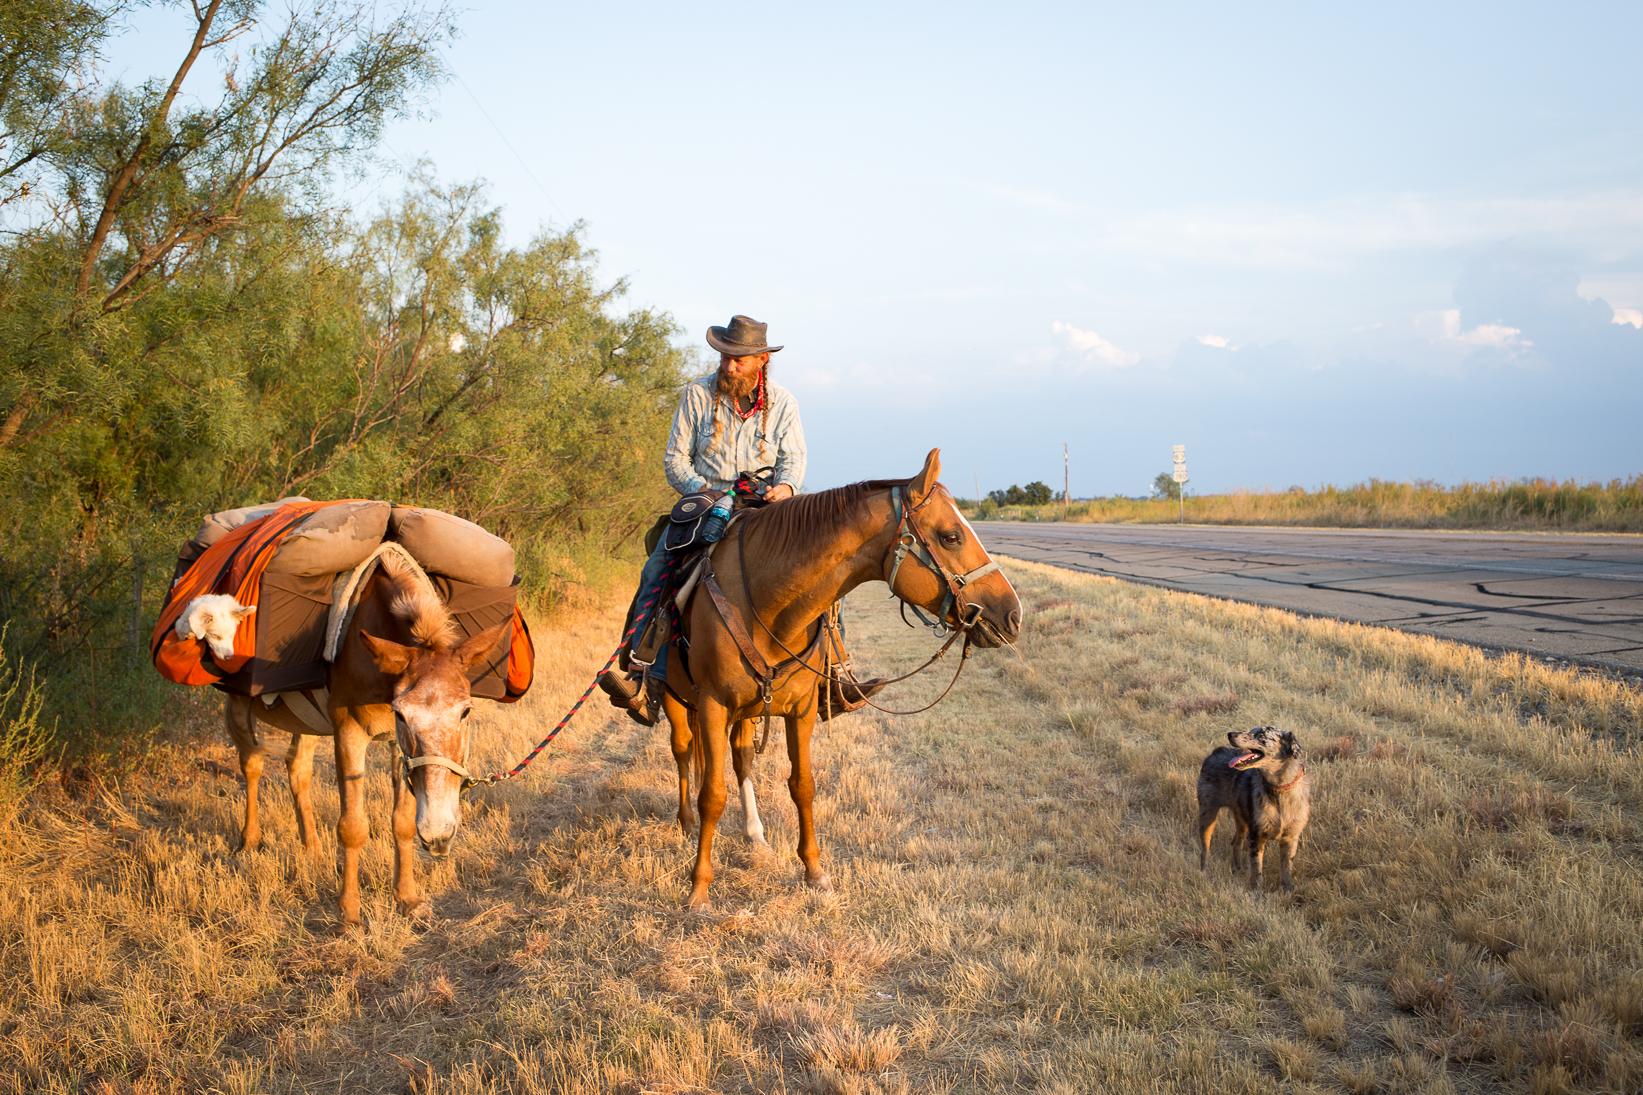 Bryan Brant. Dickens County, Texas.